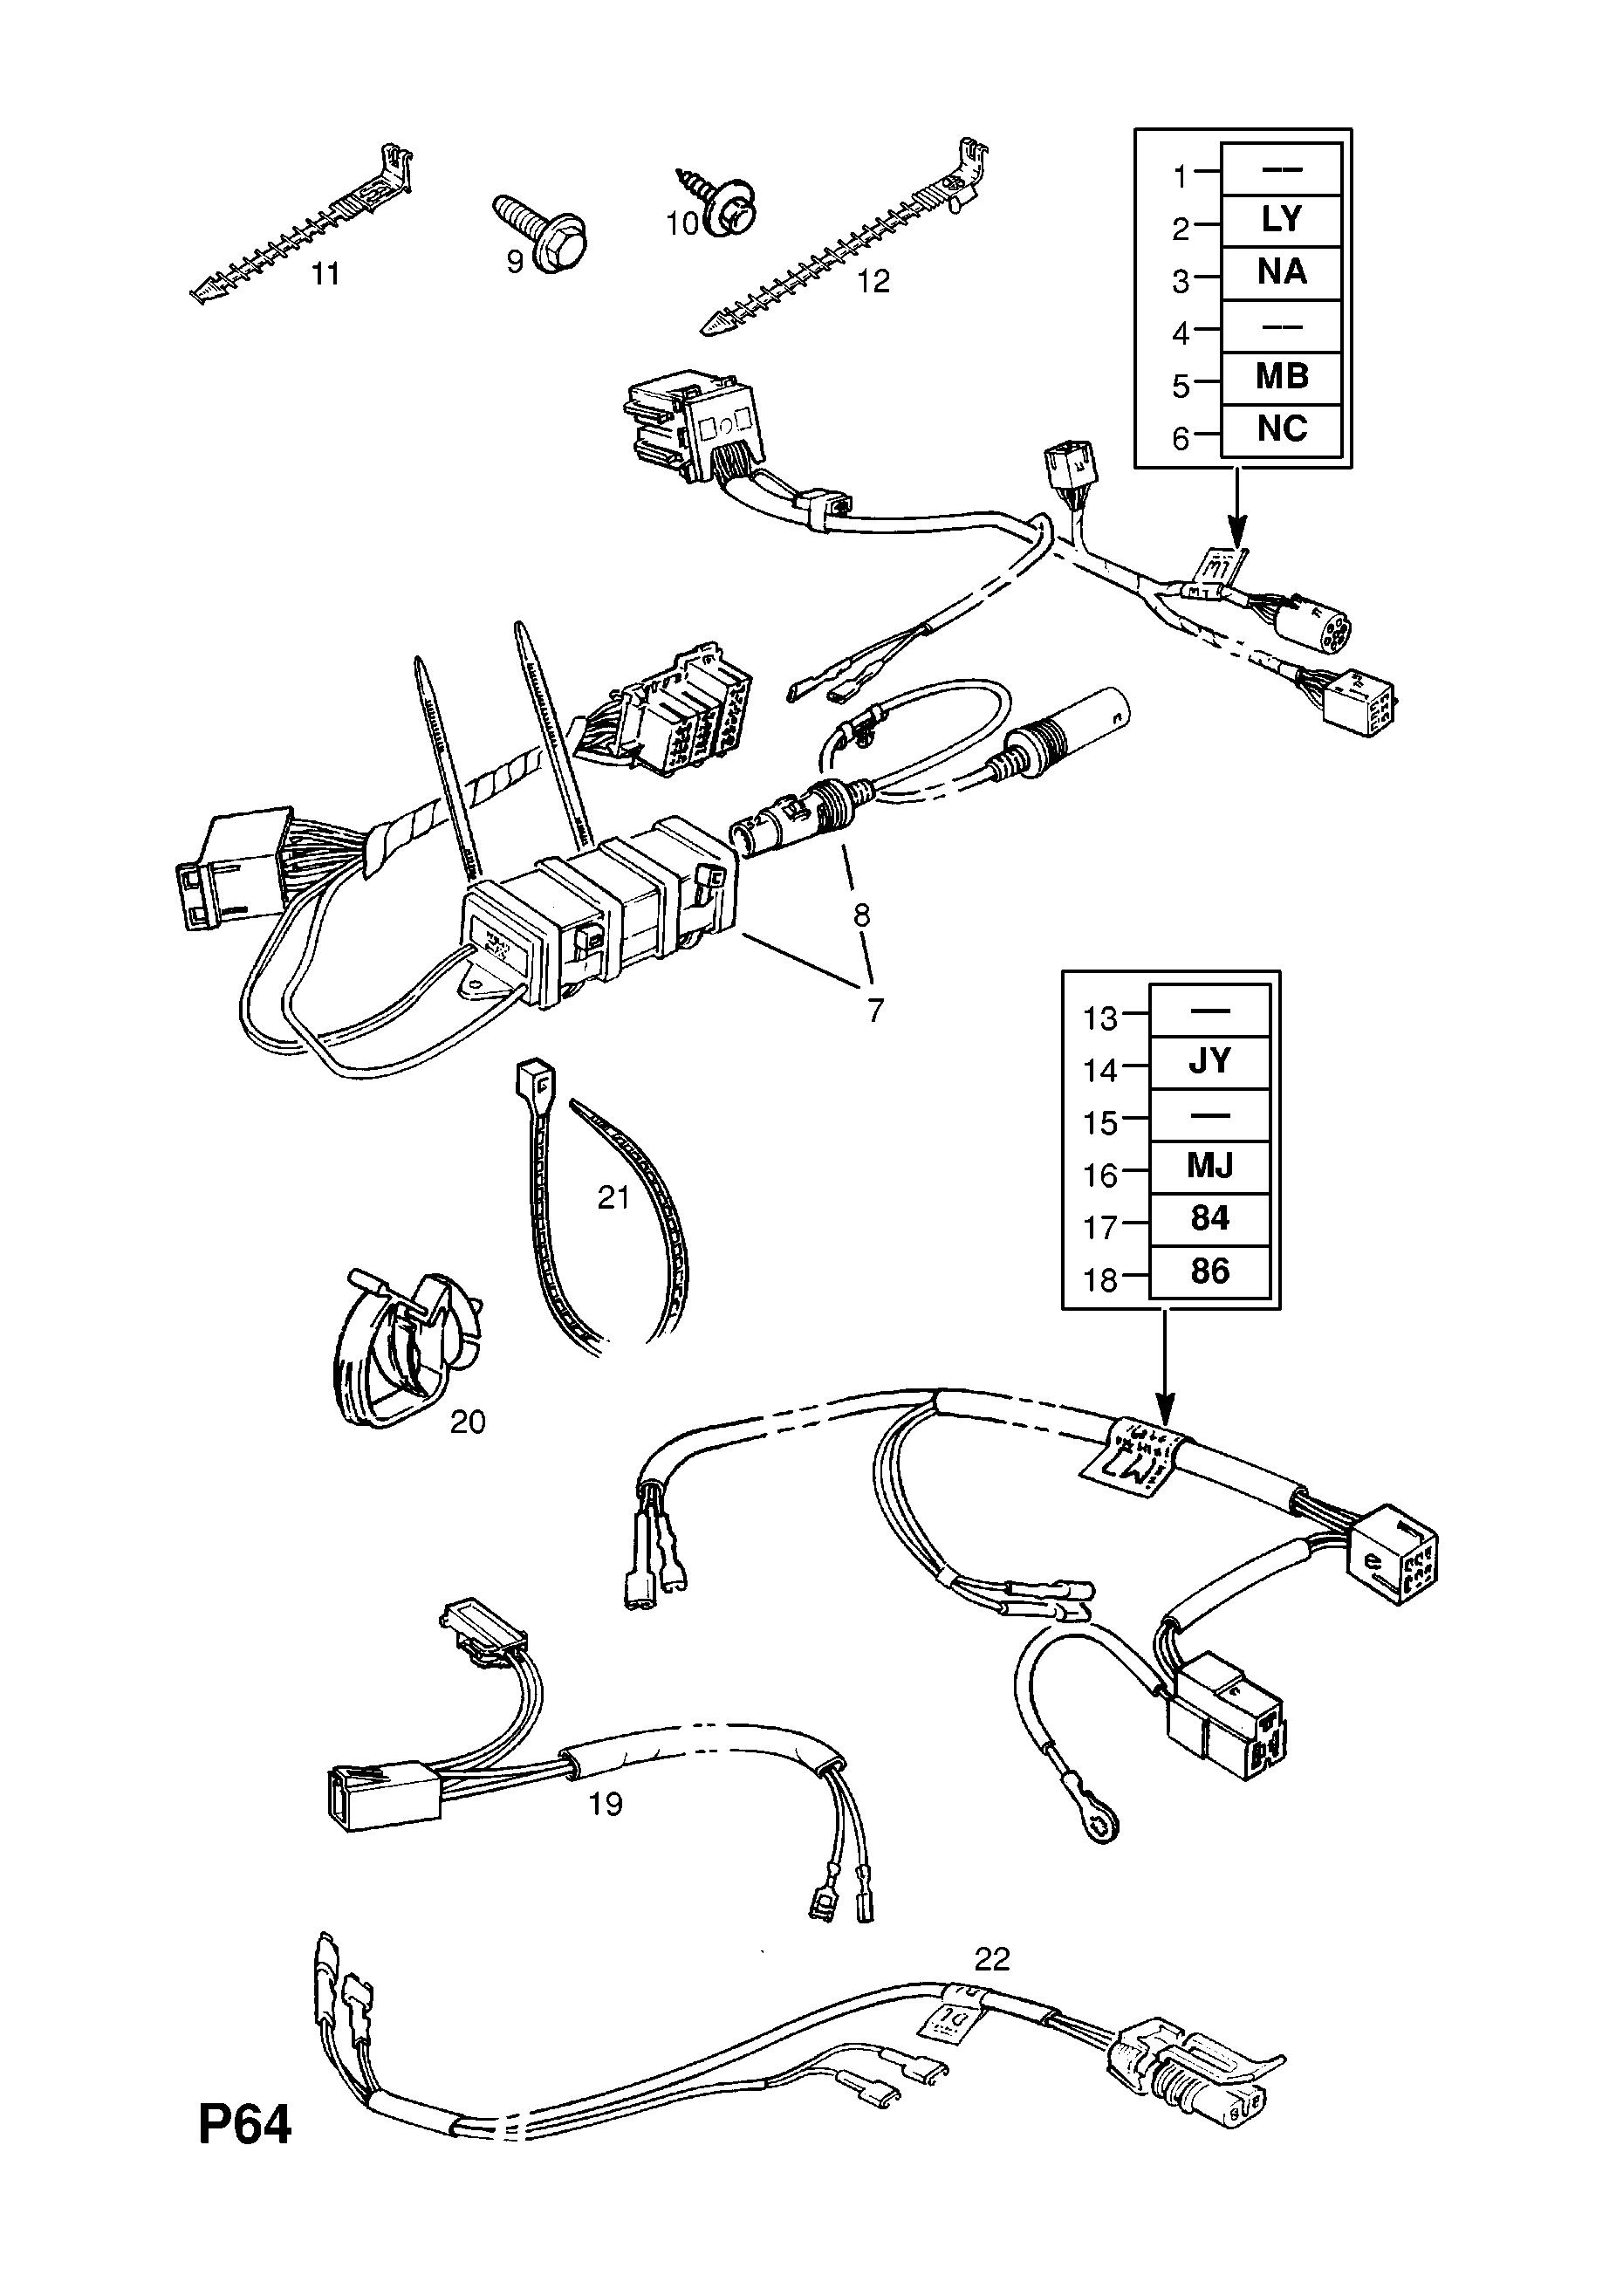 Opel Senator A Wiring Diagram Online Manuual Of Monza Data Rh 45 Hrc Solarhandel De